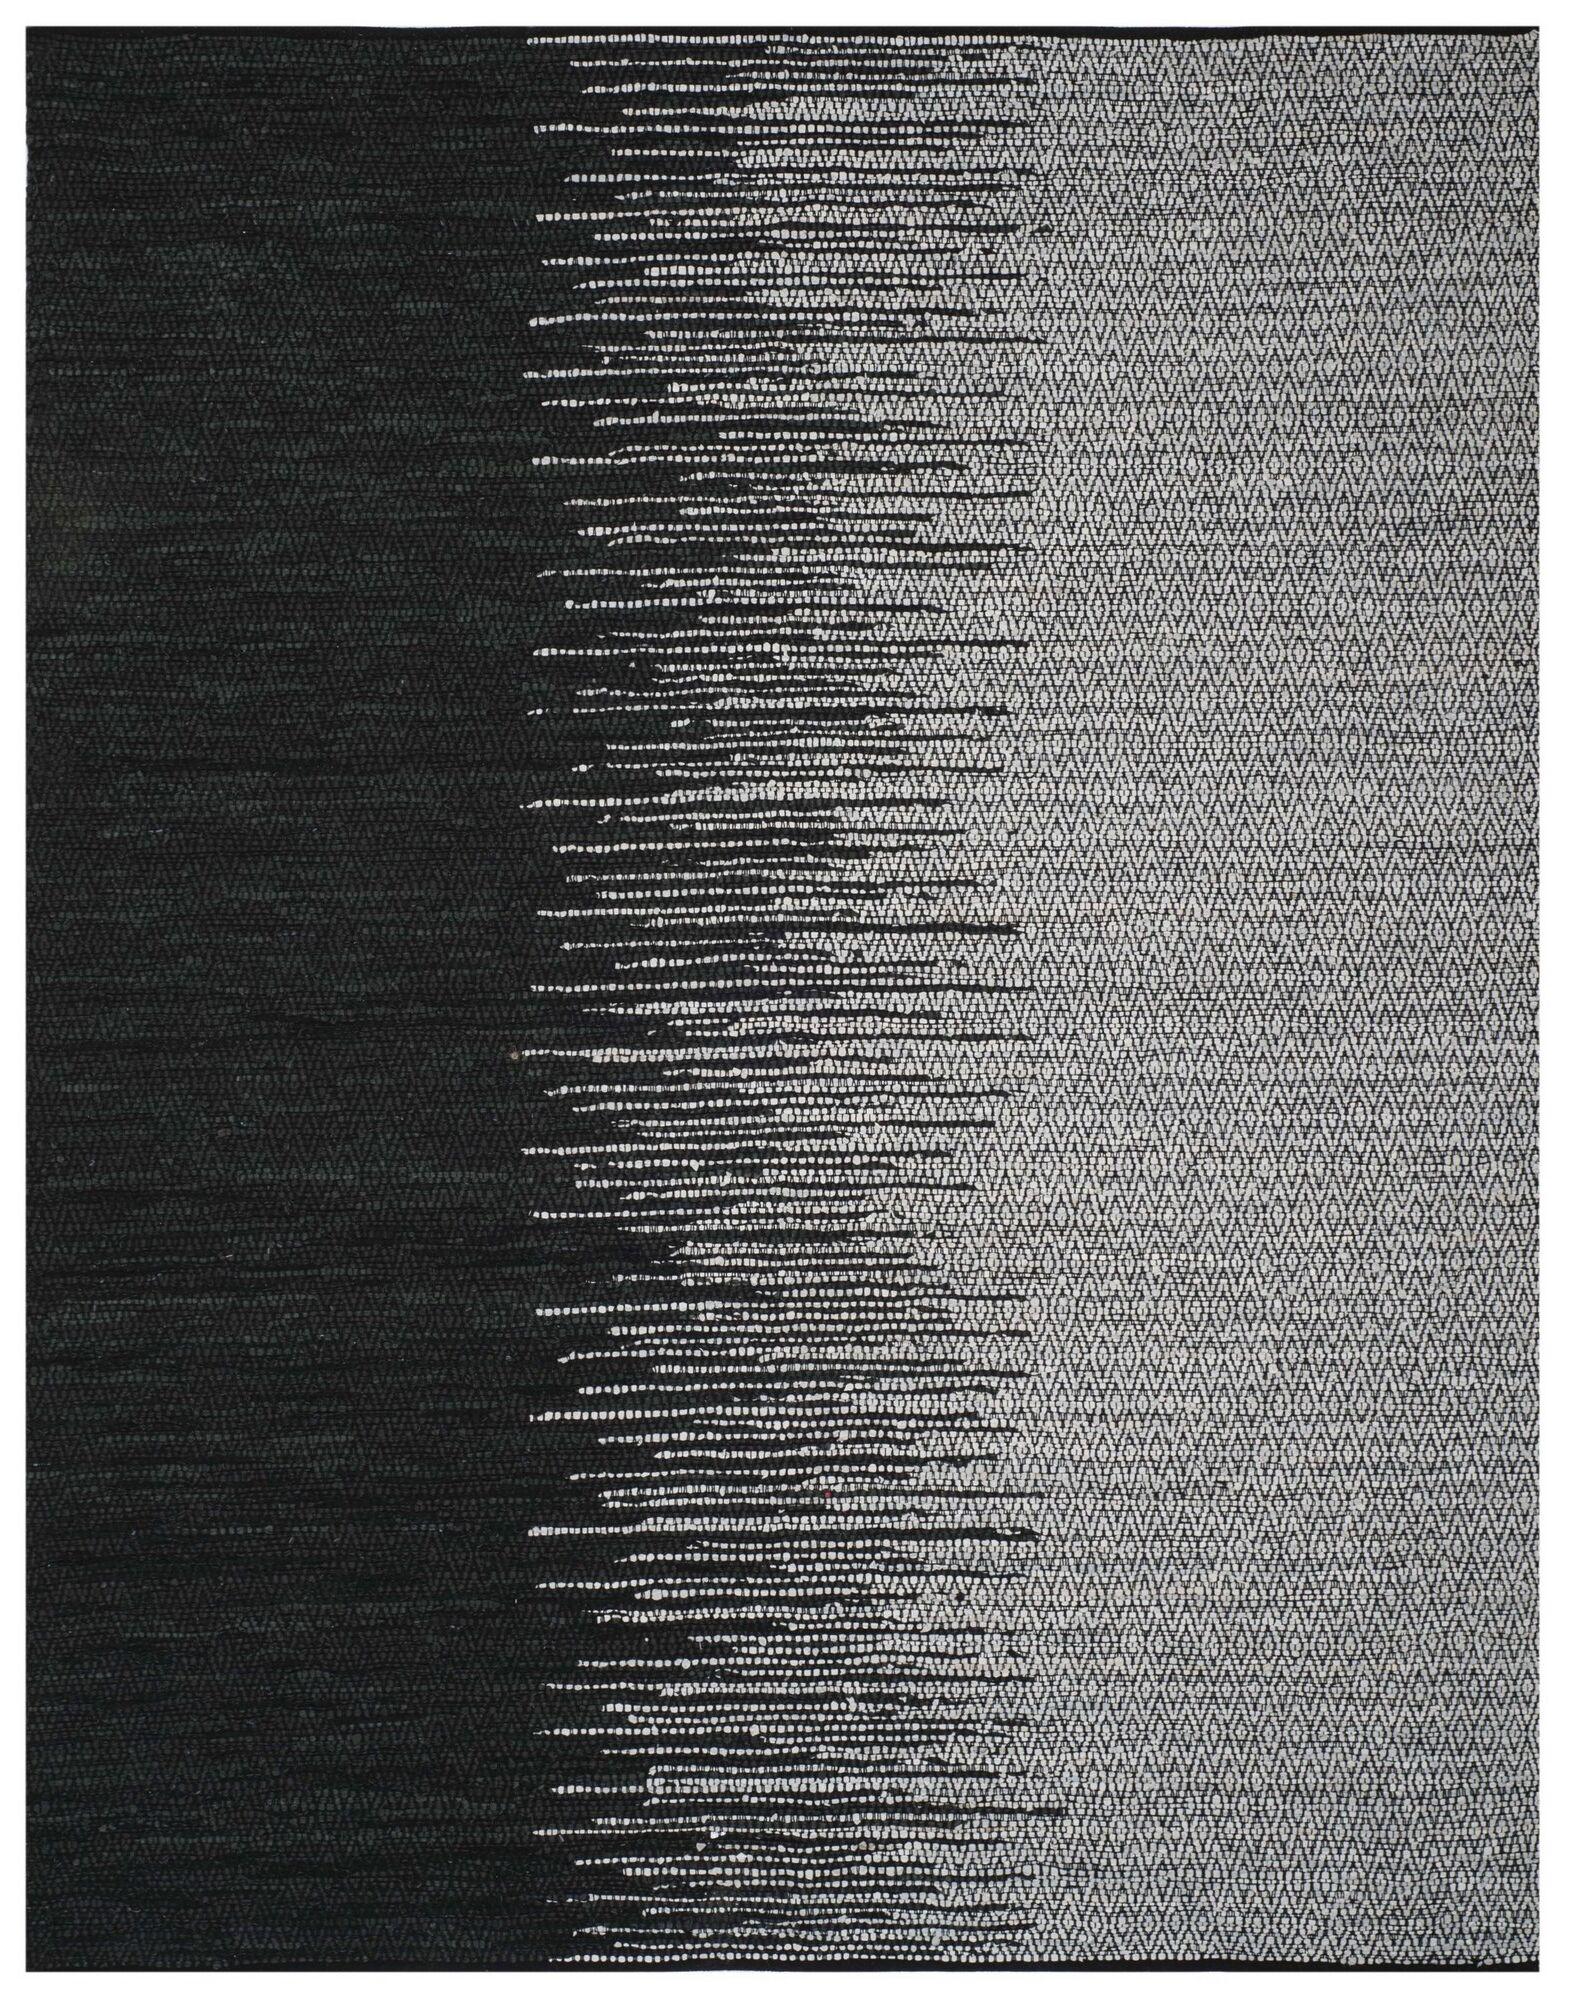 Erik Hand-Woven Light Grey/Black Area Rug Rug Size: Rectangle 8' x 10'